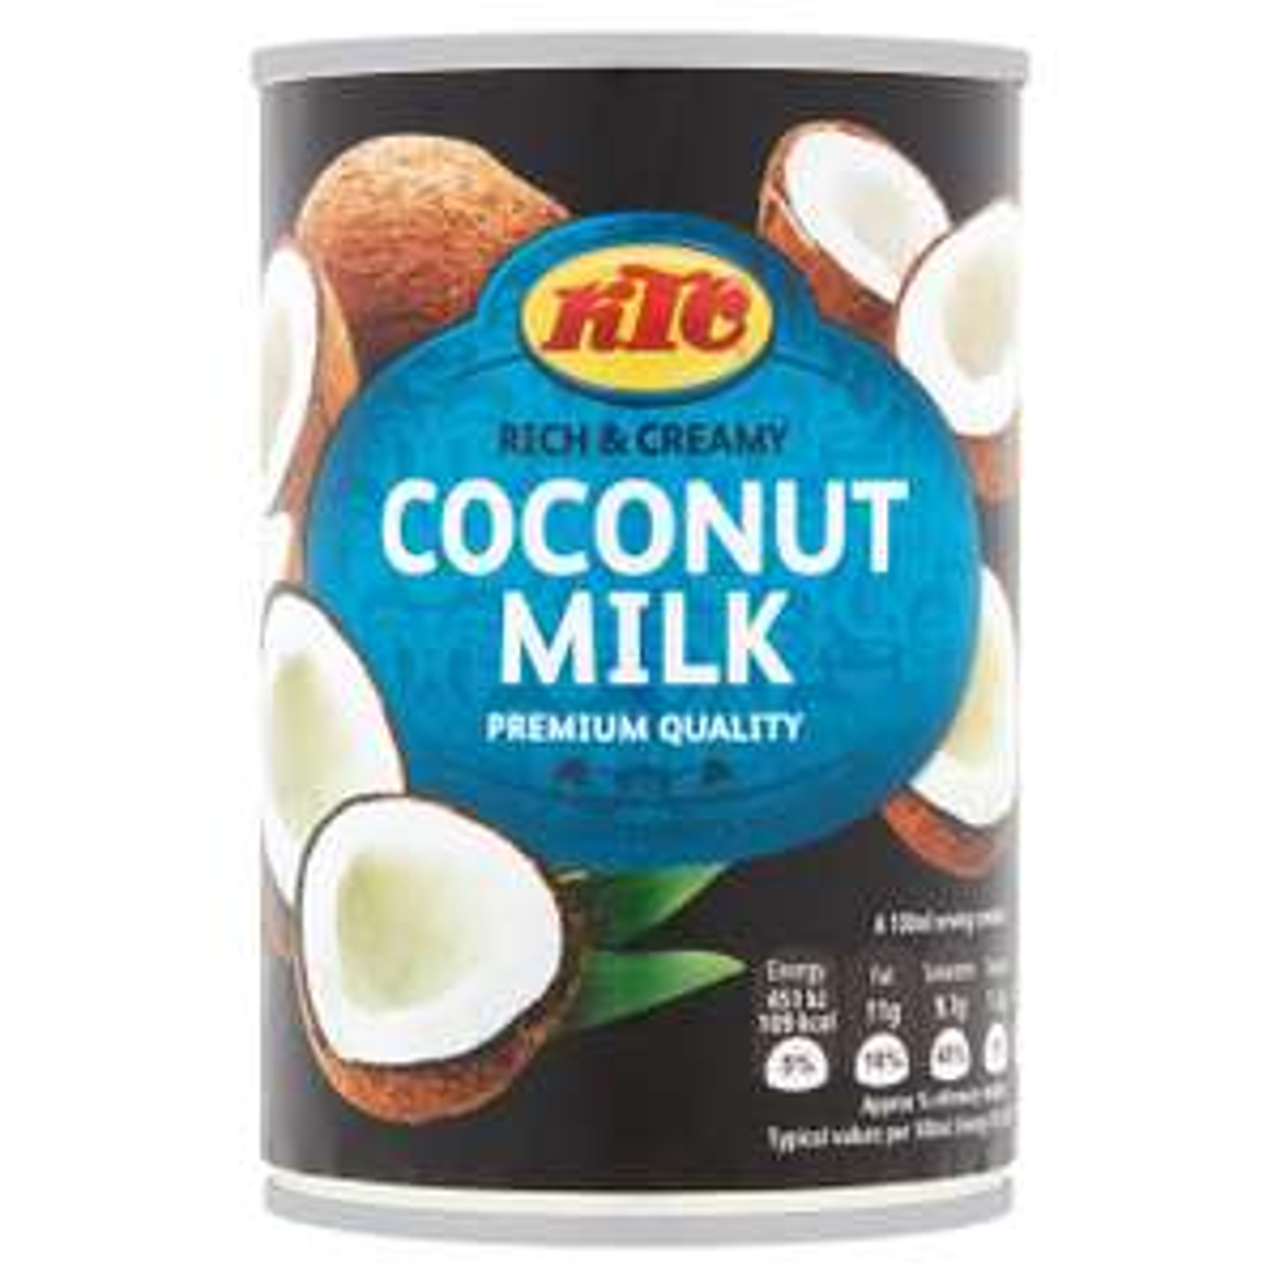 KTC Coconut Milk 400g - 50p instore/online @ Morrisons